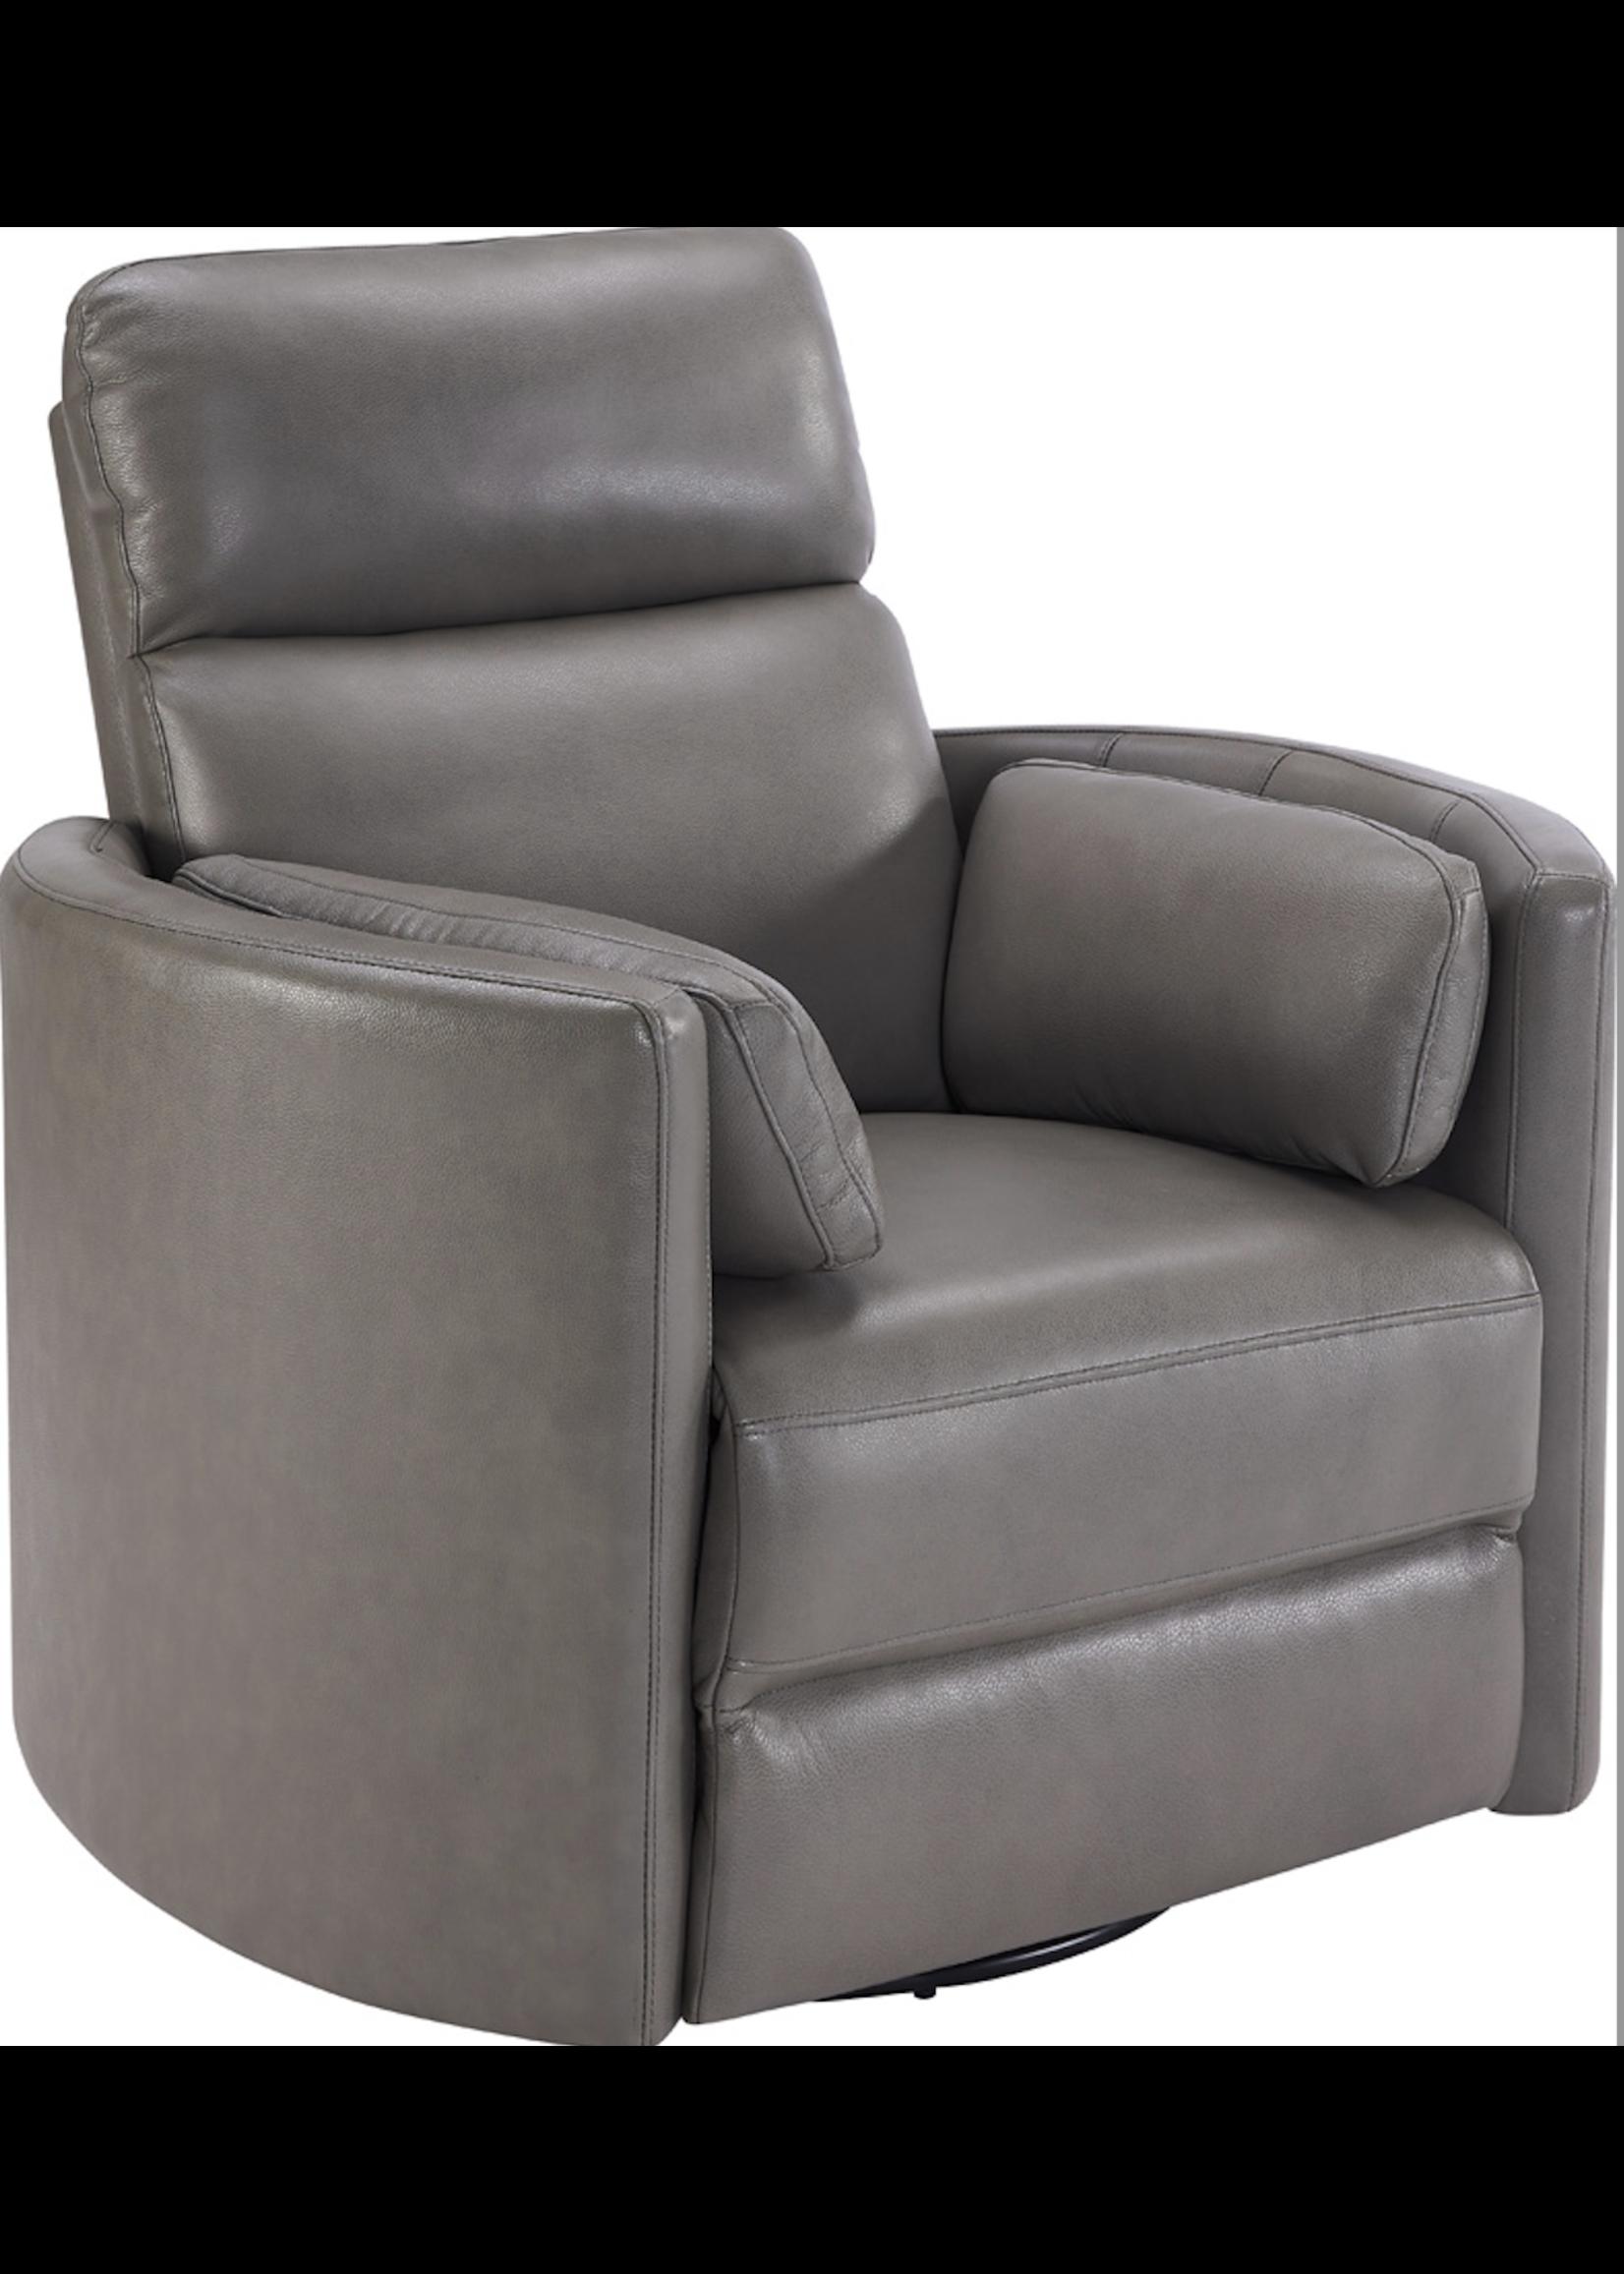 New PH Radius Florence Heron Real Leather Recliner